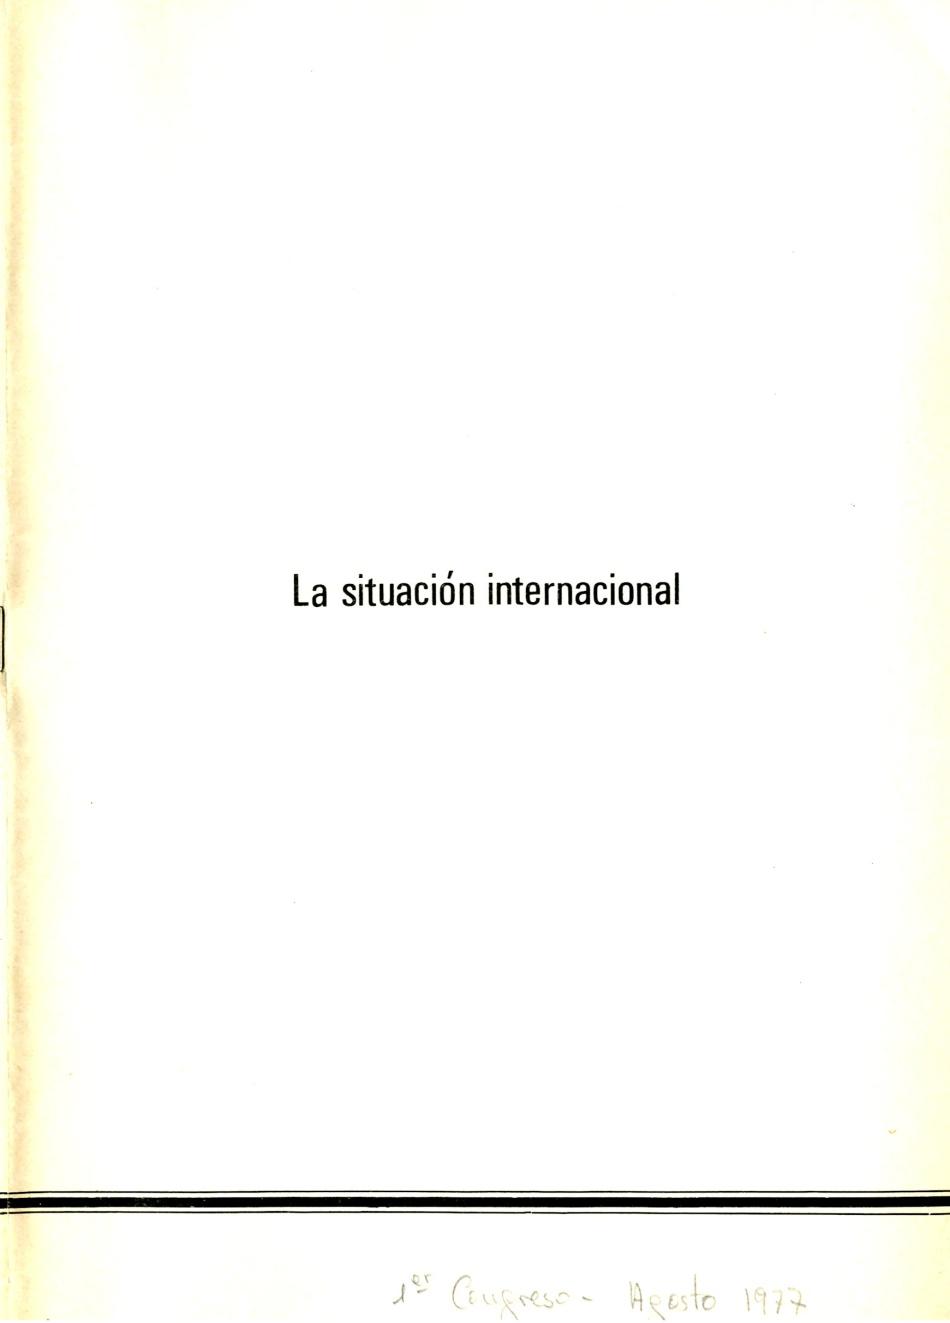 La situación Internacional. Revolución Socialista. Revolución Proletaria.Imperialismo como últina etapa del Capitalismo. Imperialismo antesala del Socialismo según Lenin